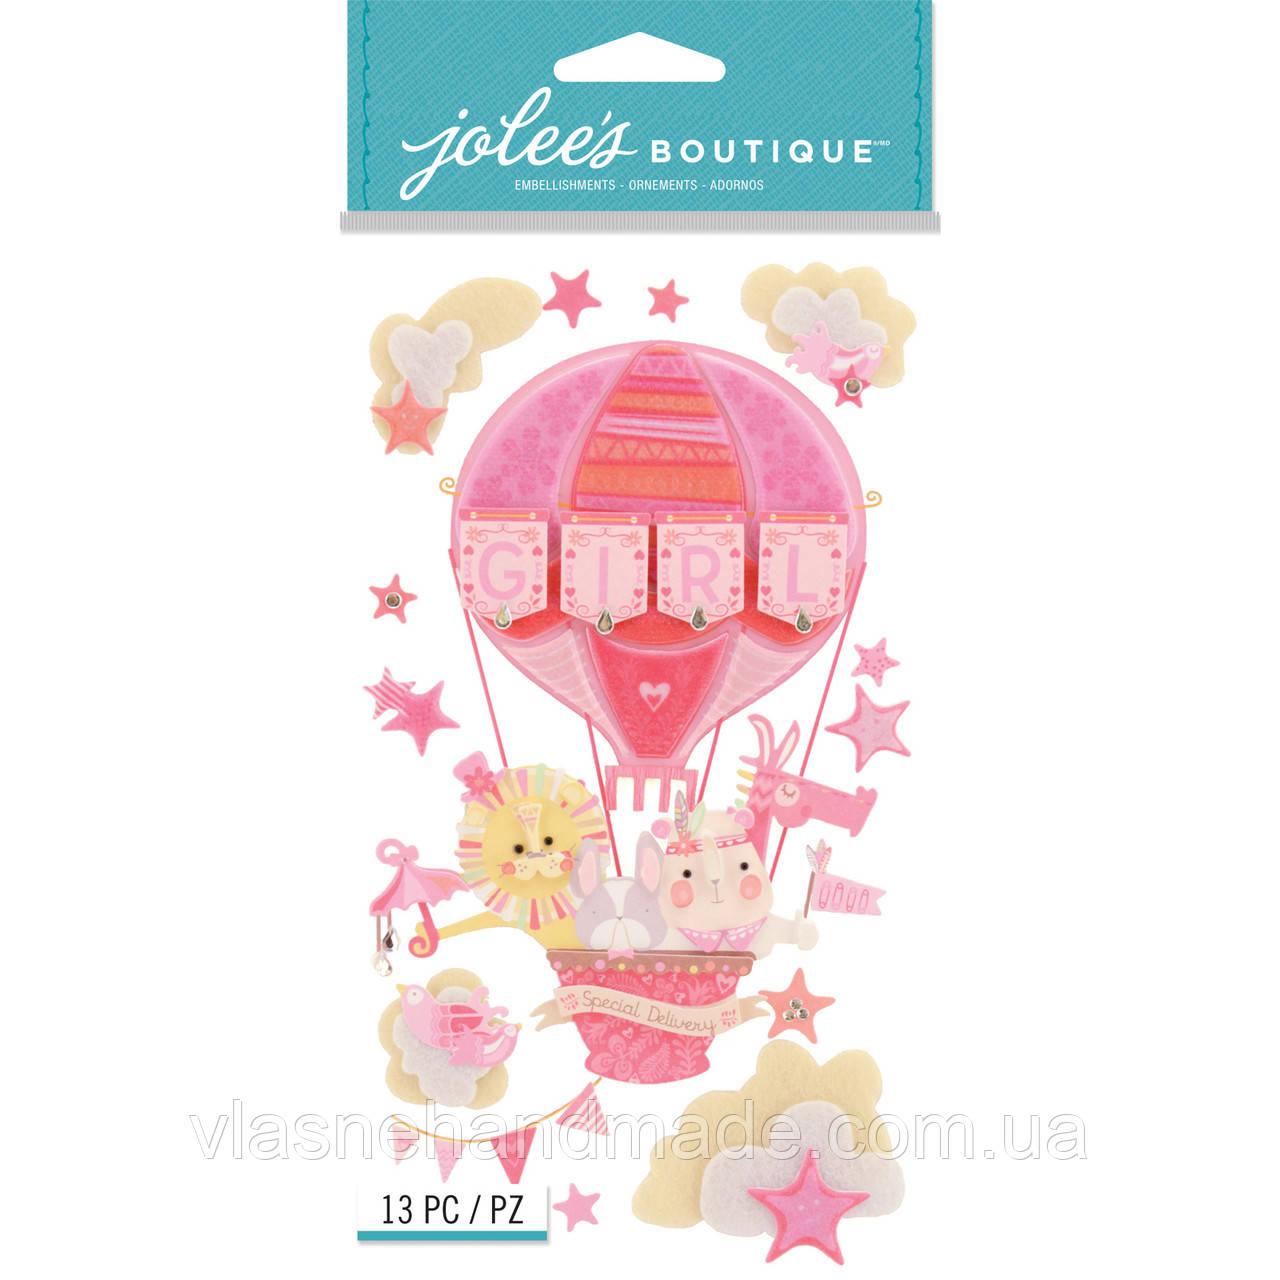 Наклейки 3D - Baby Girl - Joleen's Boutique - 13 шт.